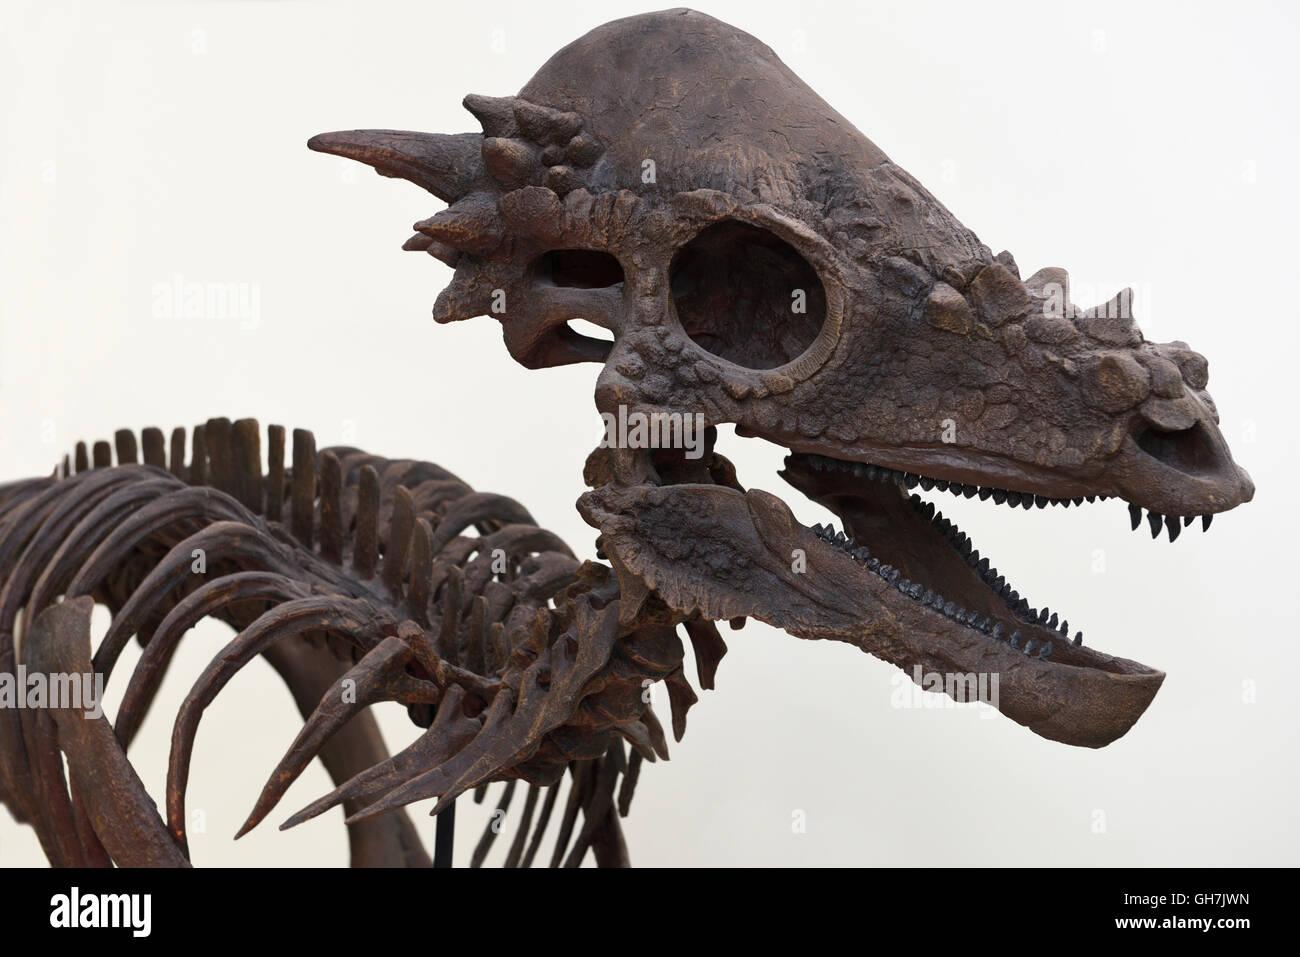 Pachycephalosaurus herbevorous dinosaur skeleton cast of fissil bones from Cretaceous period ROM Royal Ontario Museum - Stock Image